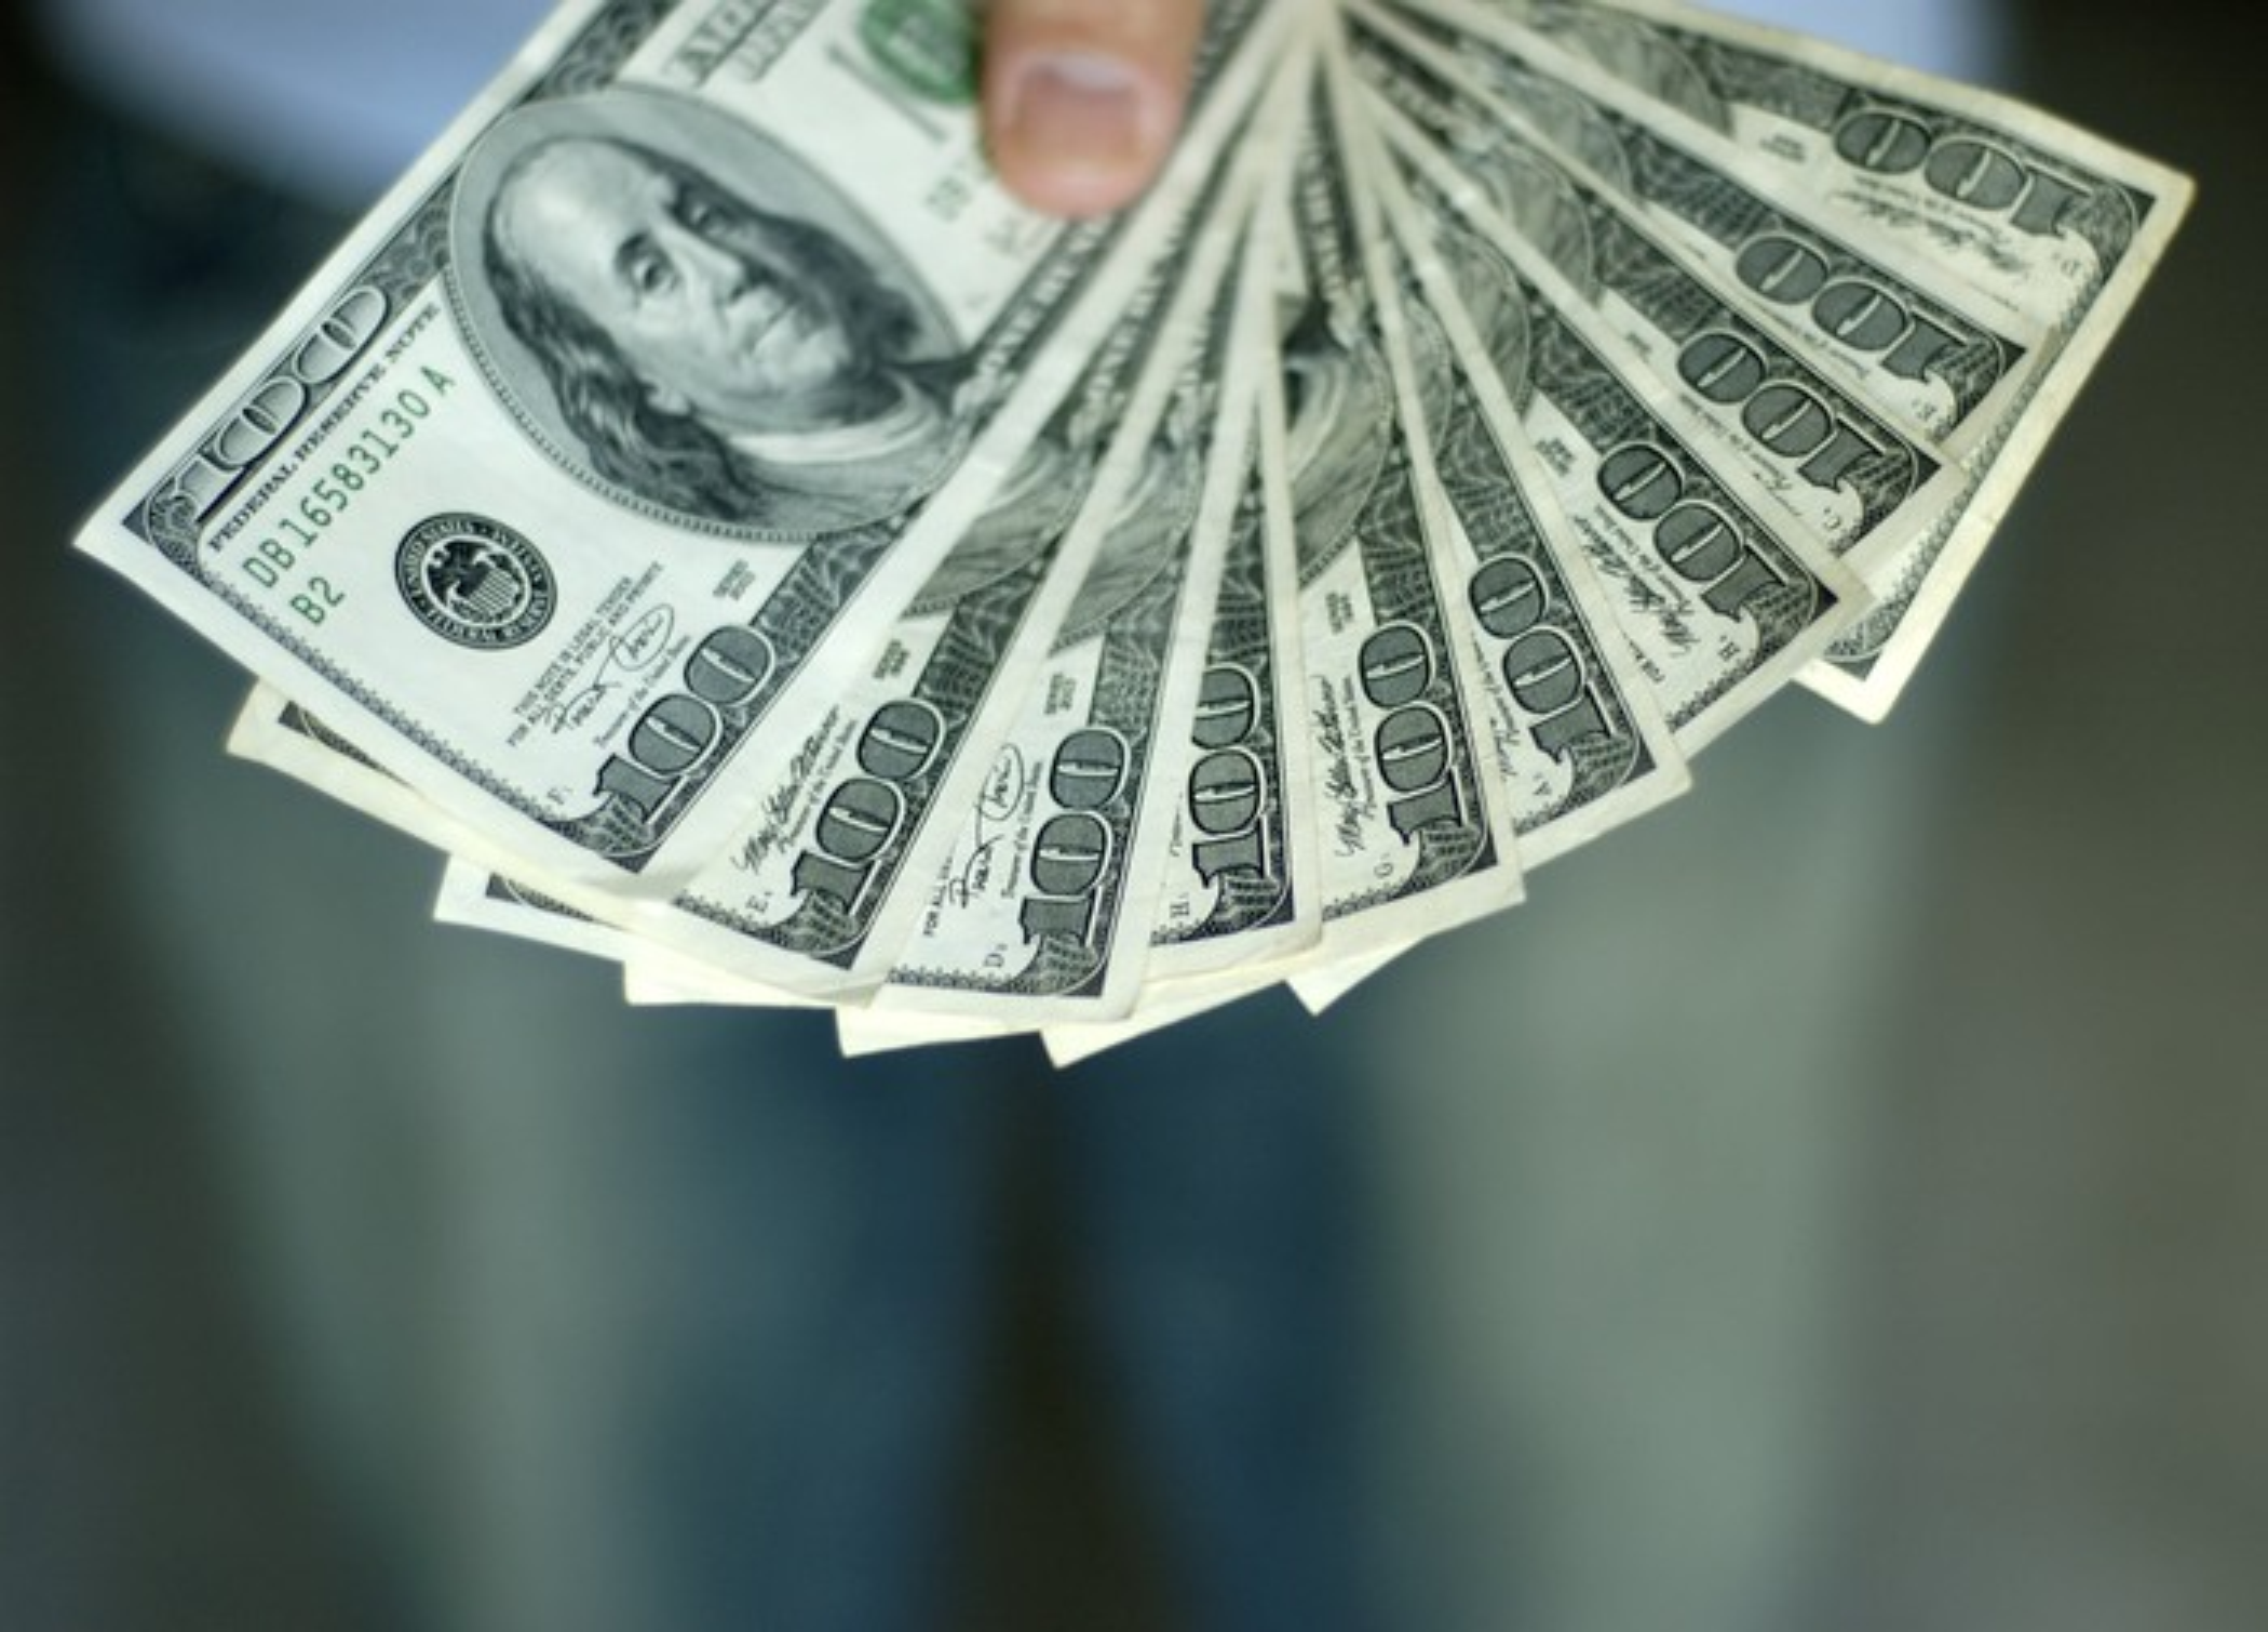 Hand holding 10 hundred-dollar bills.